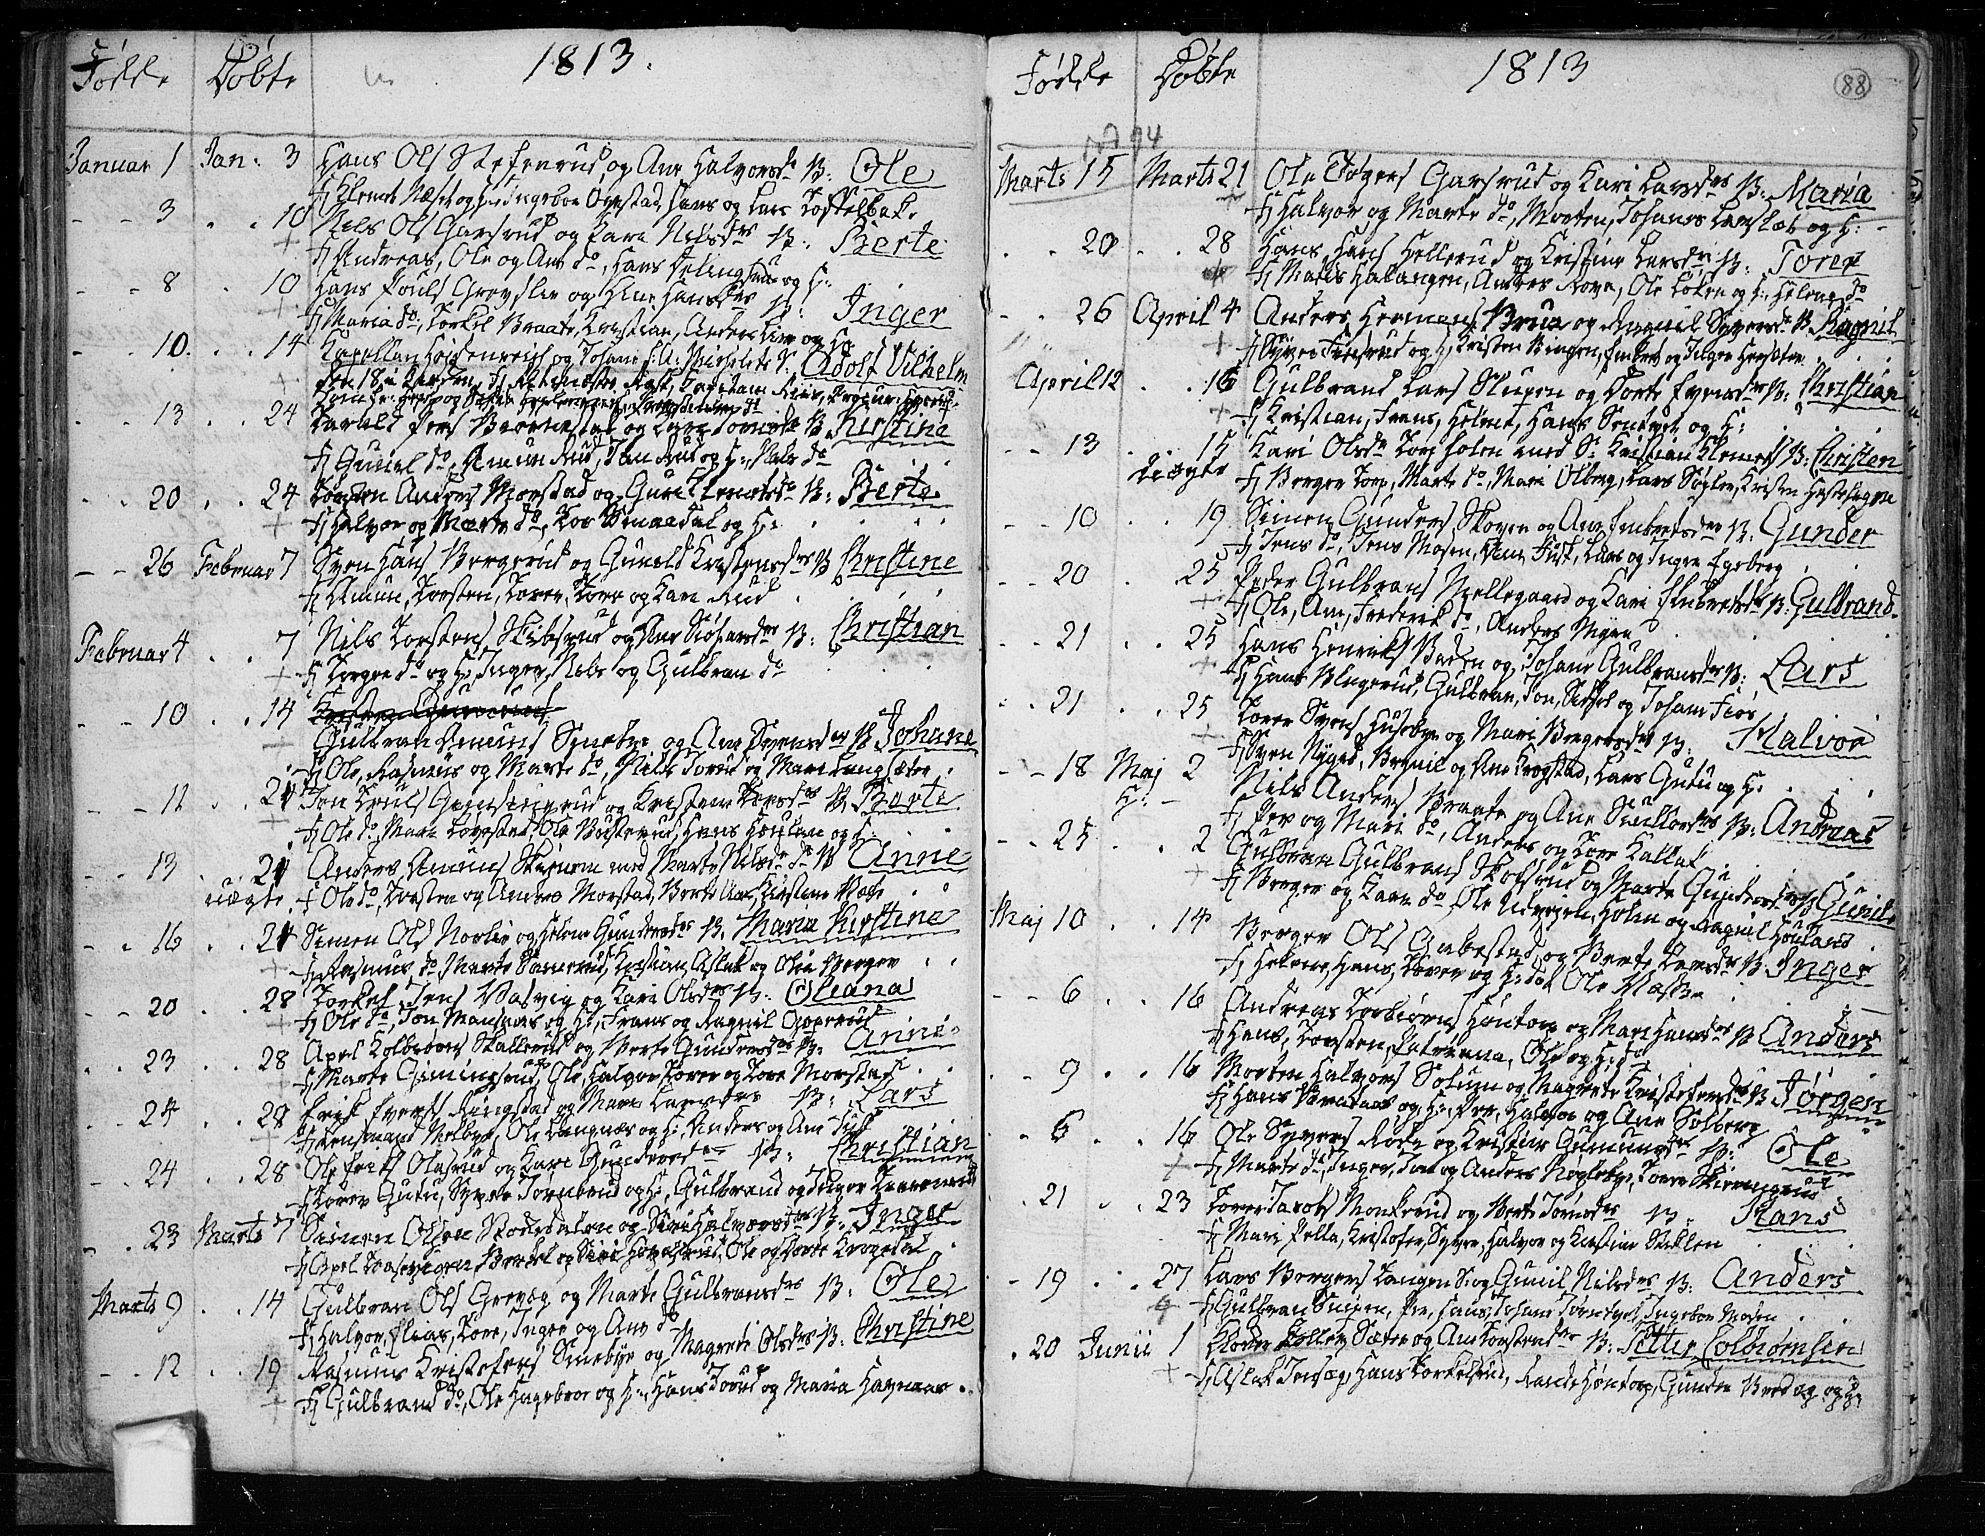 SAO, Trøgstad prestekontor Kirkebøker, F/Fa/L0005: Ministerialbok nr. I 5, 1784-1814, s. 88